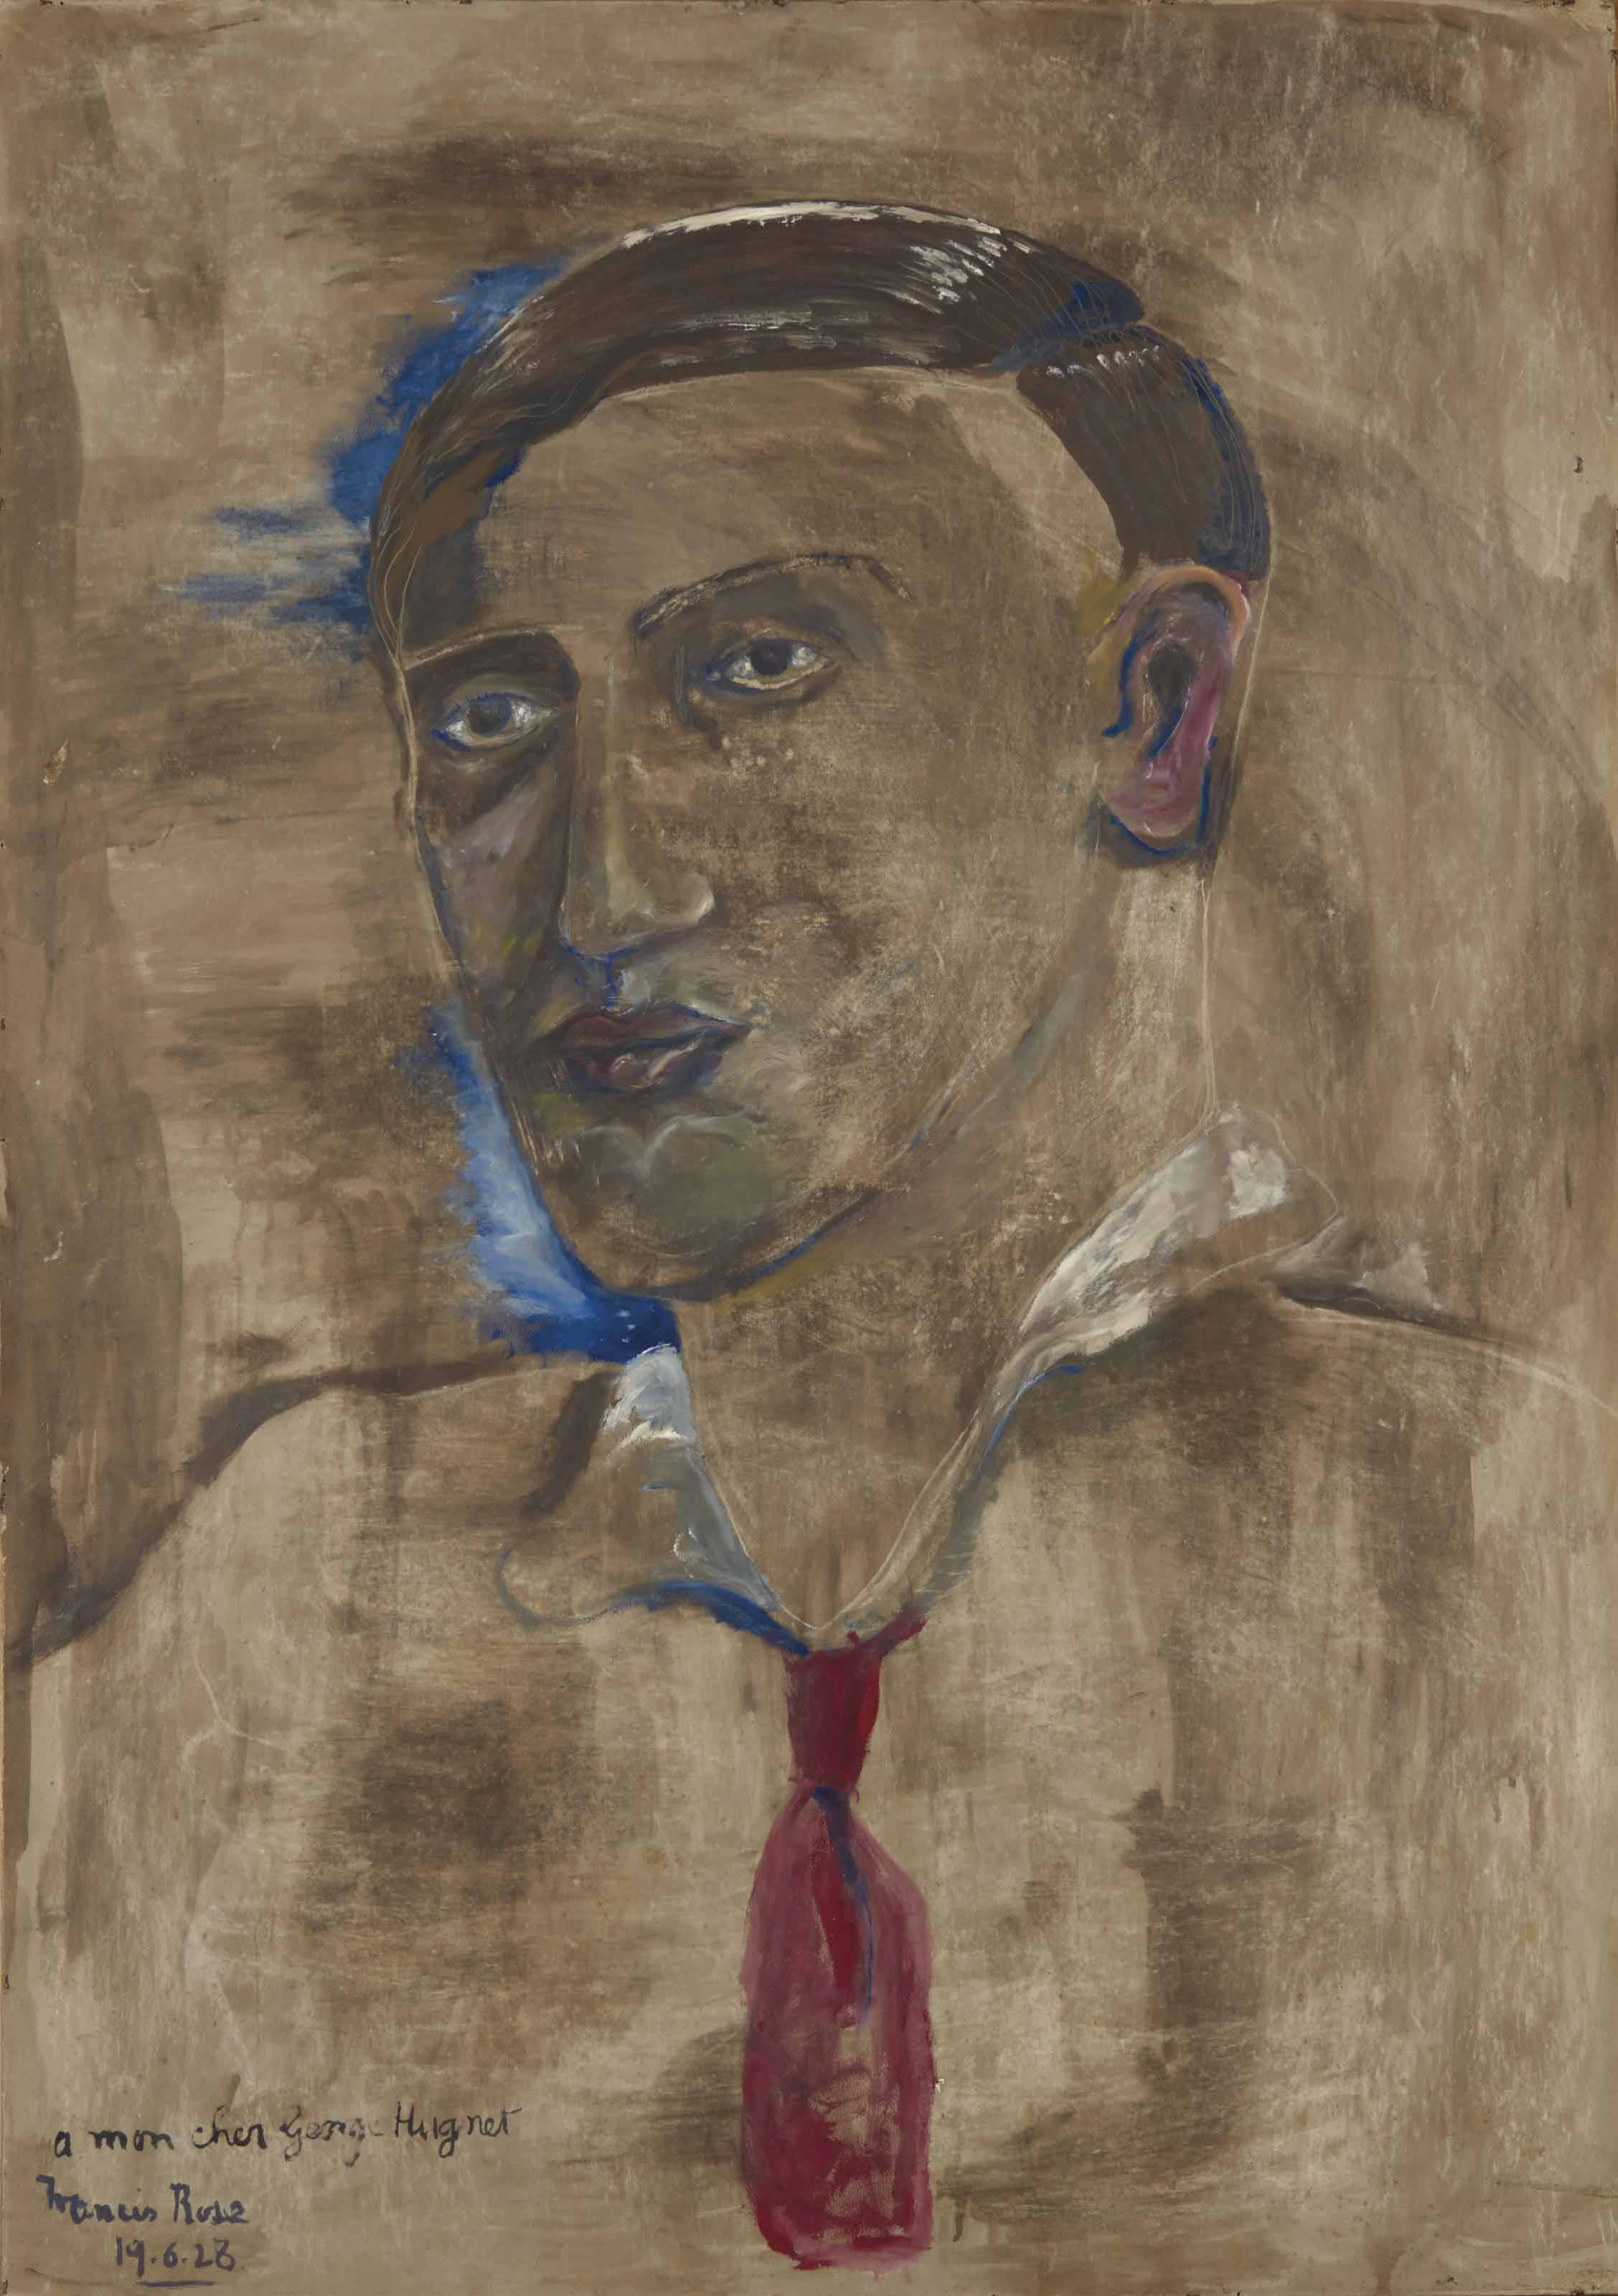 Sir Francis Cyril Rose (1909-1979)